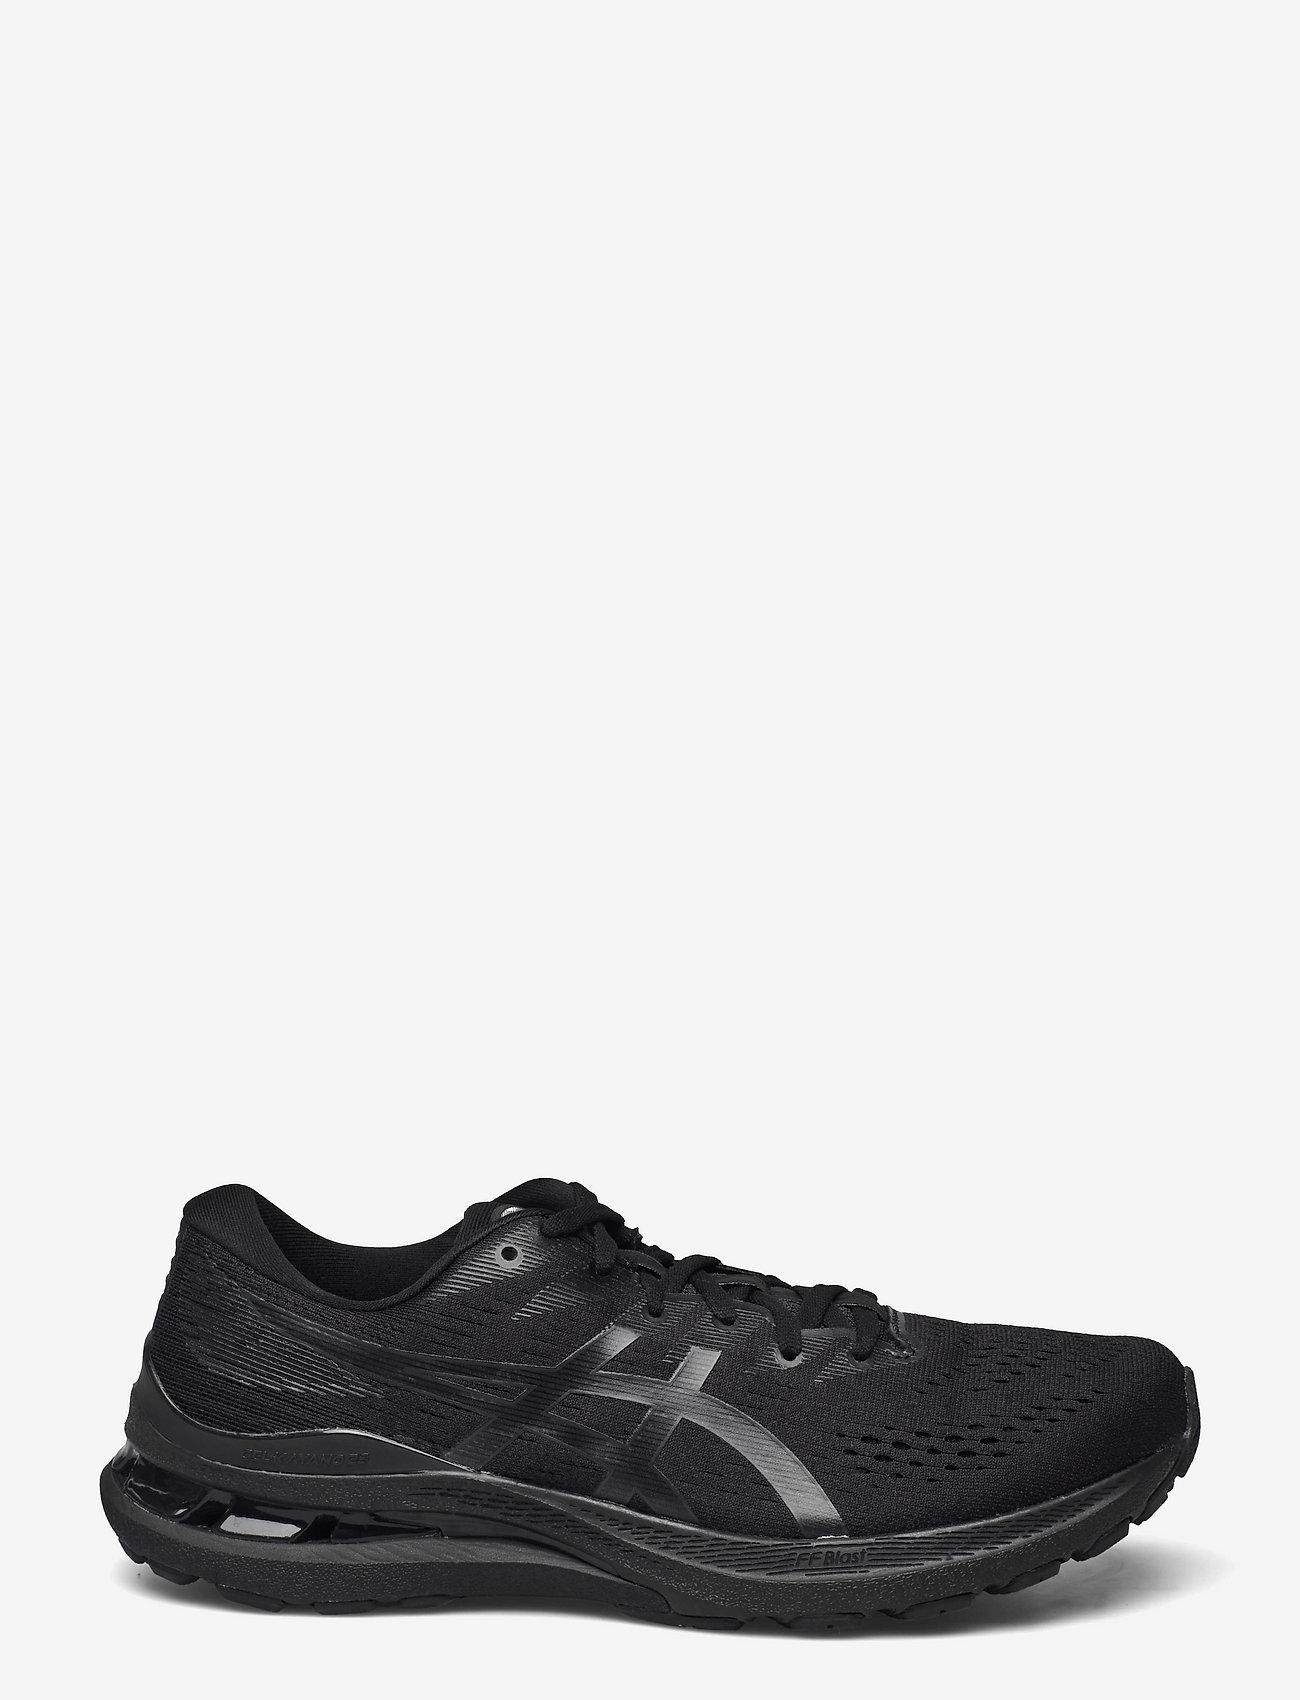 Asics - GEL-KAYANO 28 - löbesko - black/graphite grey - 1